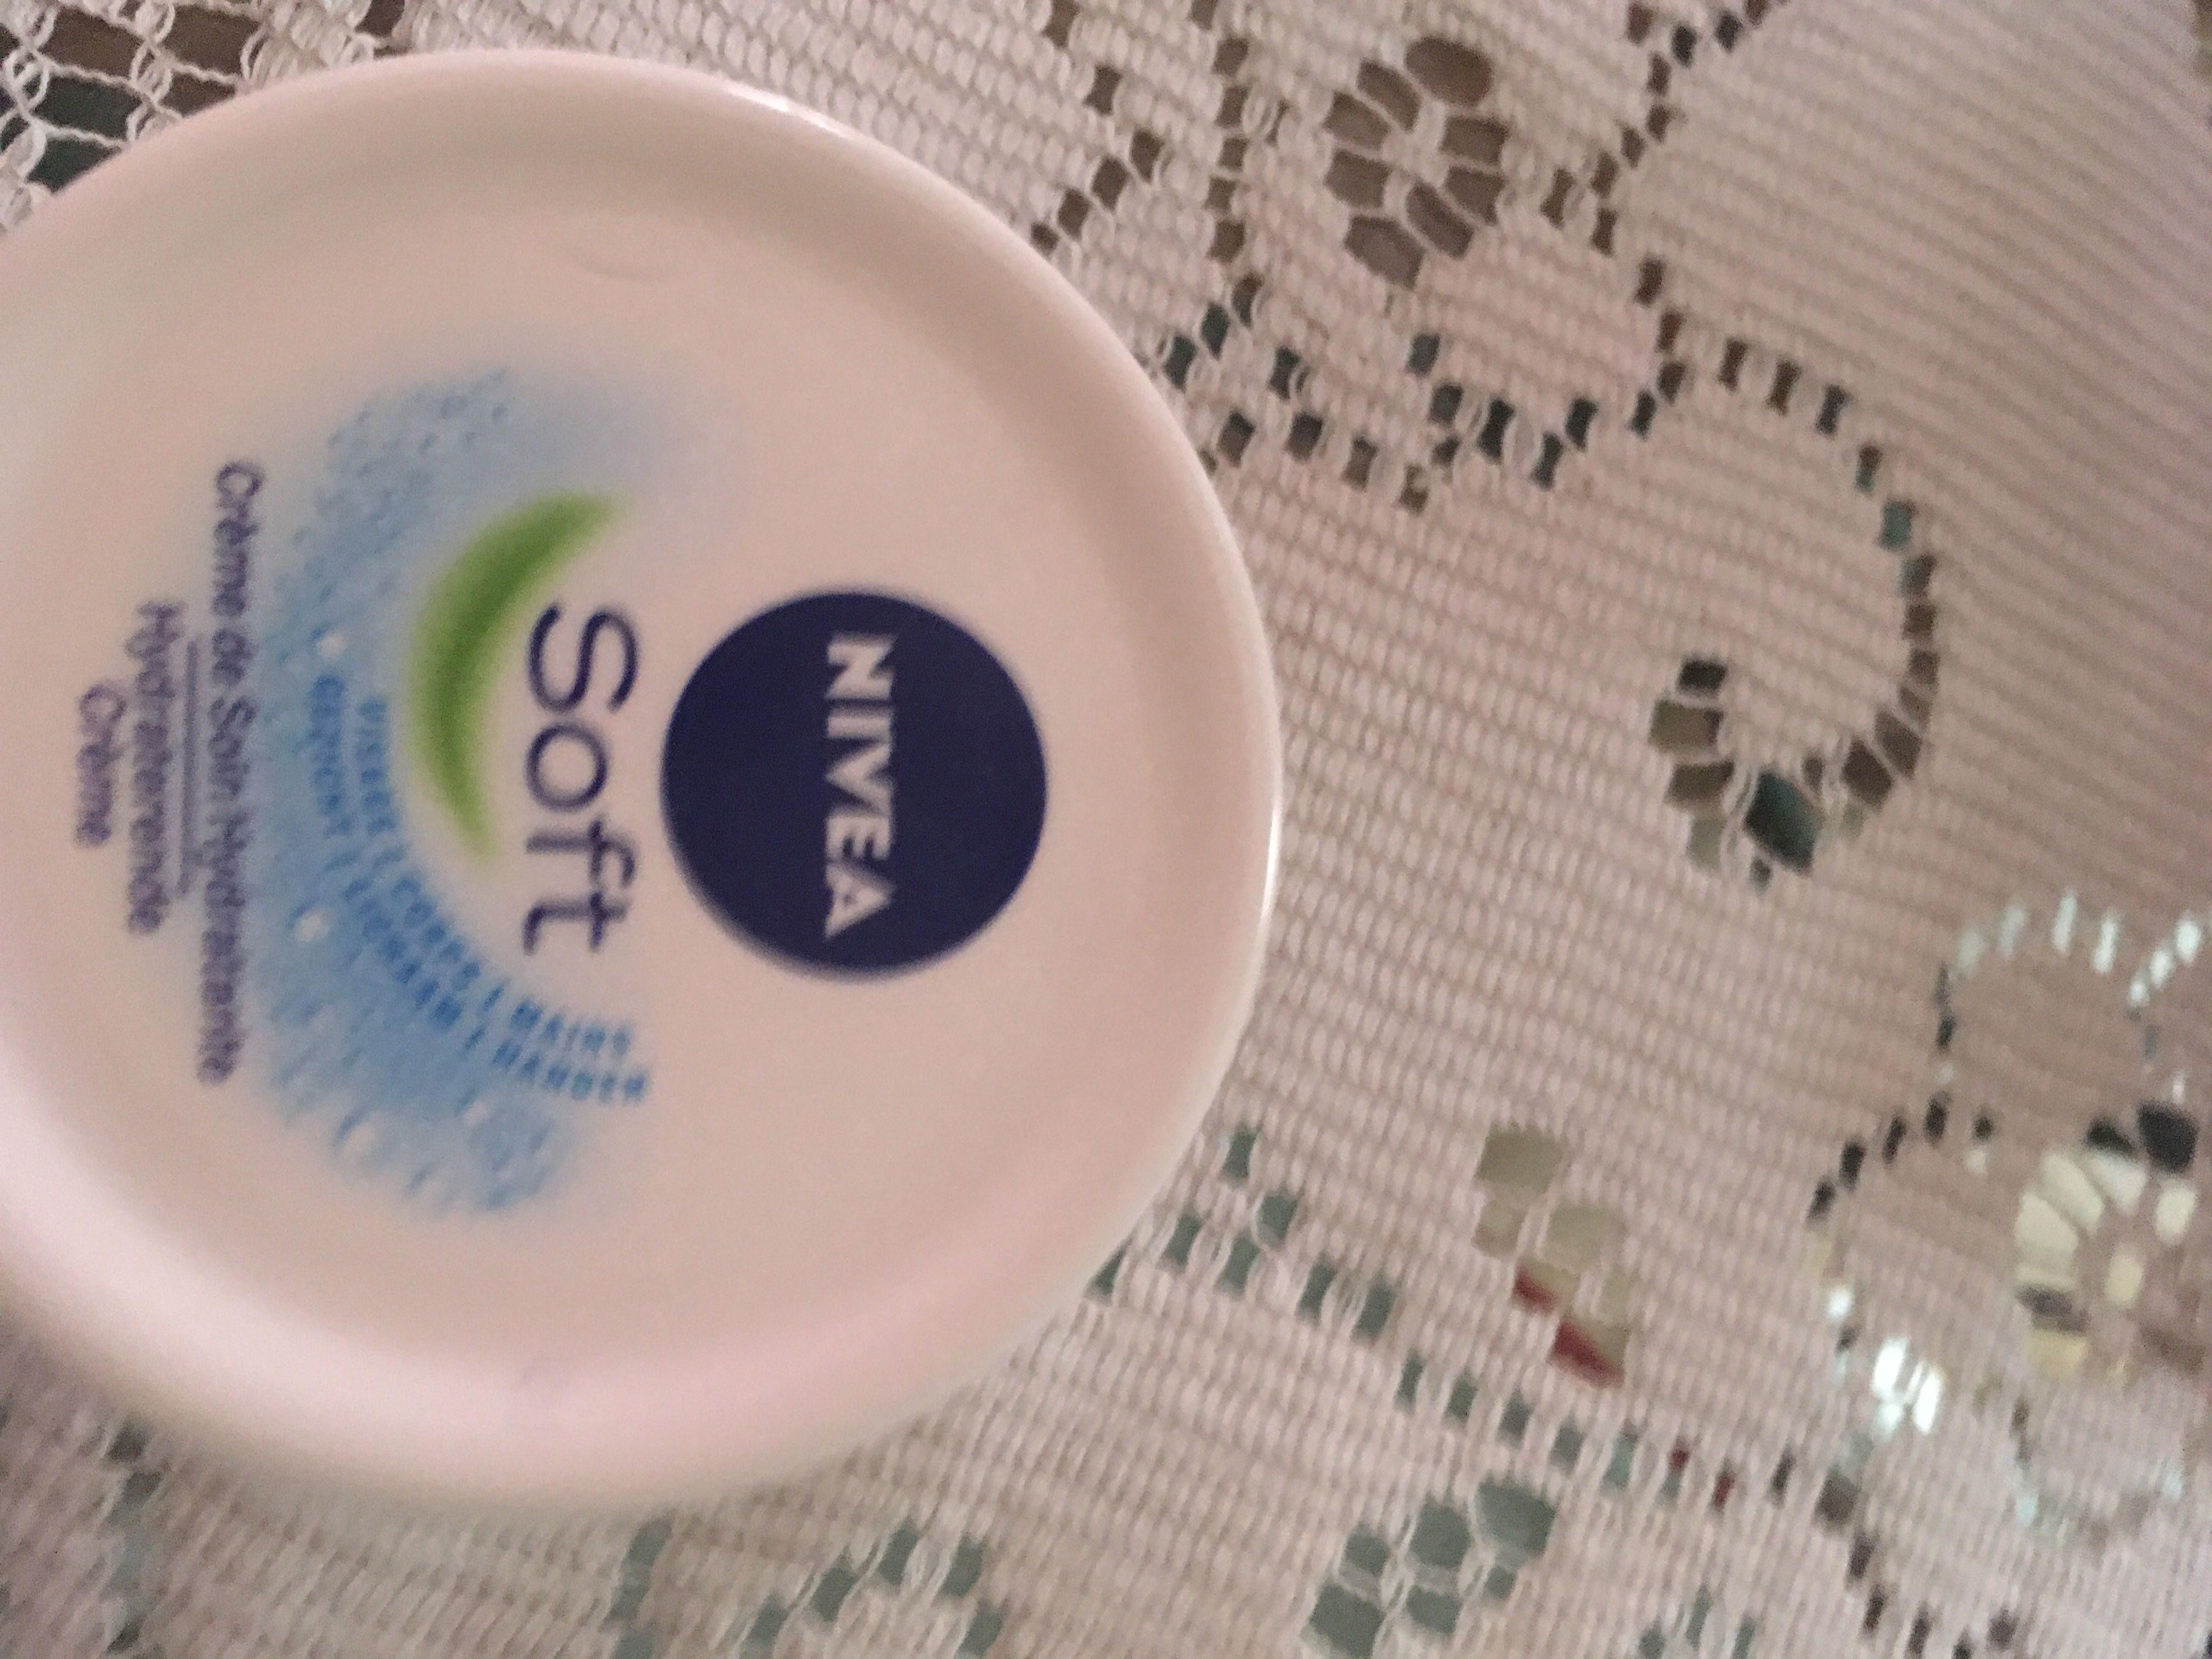 Nivea soft - Product - fr